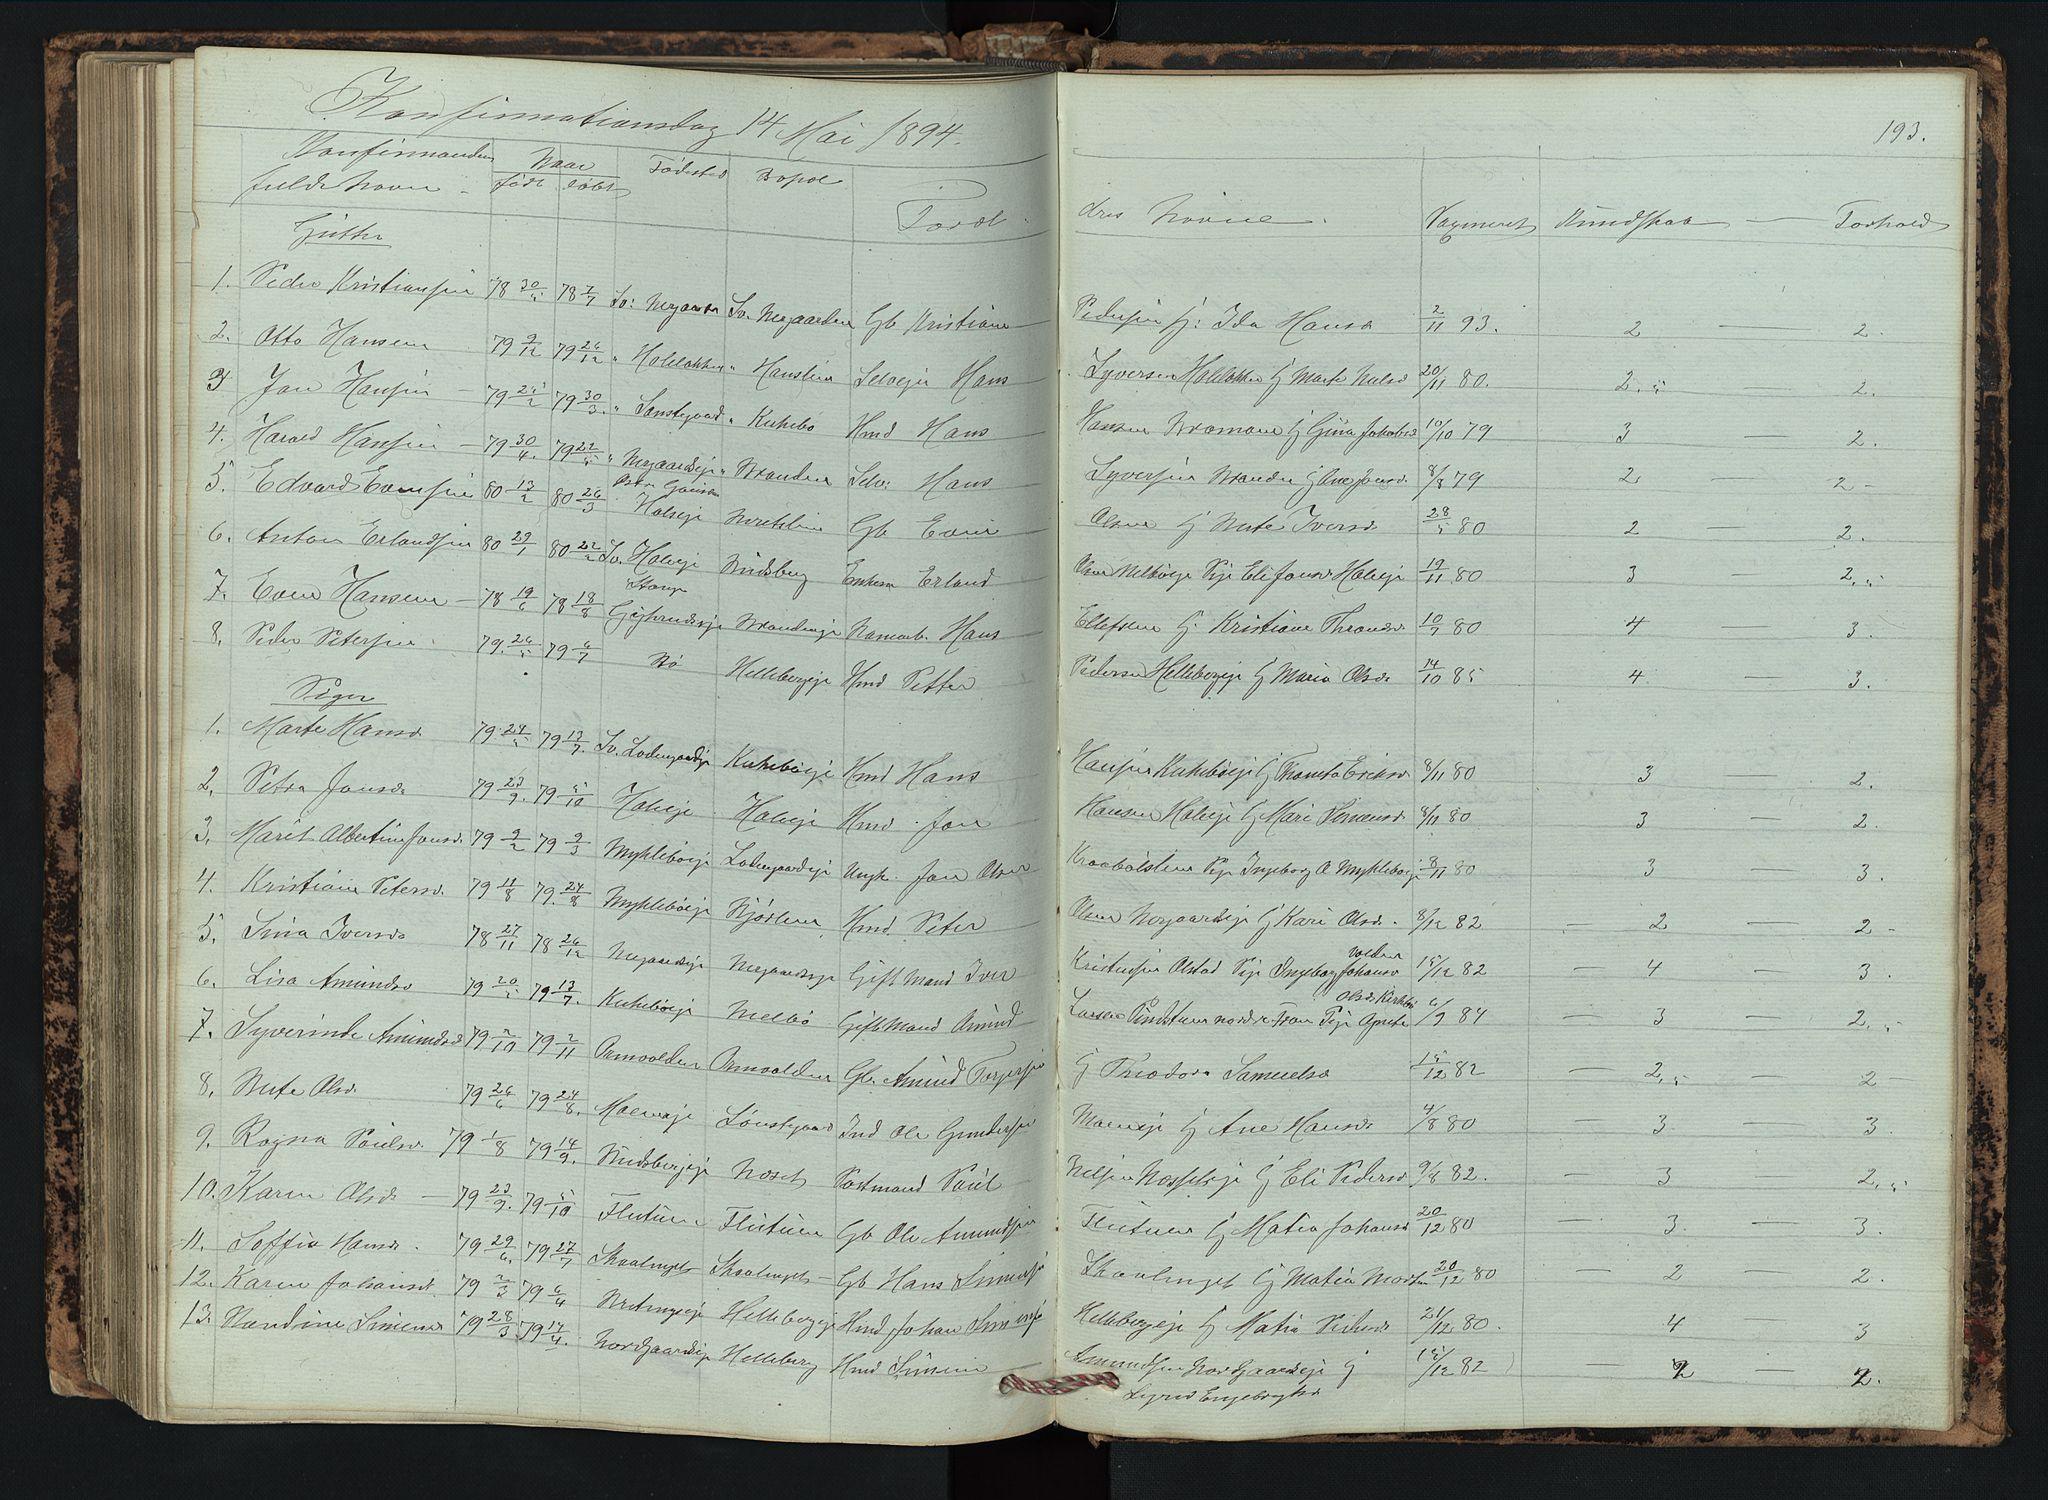 SAH, Vestre Gausdal prestekontor, Klokkerbok nr. 2, 1874-1897, s. 193